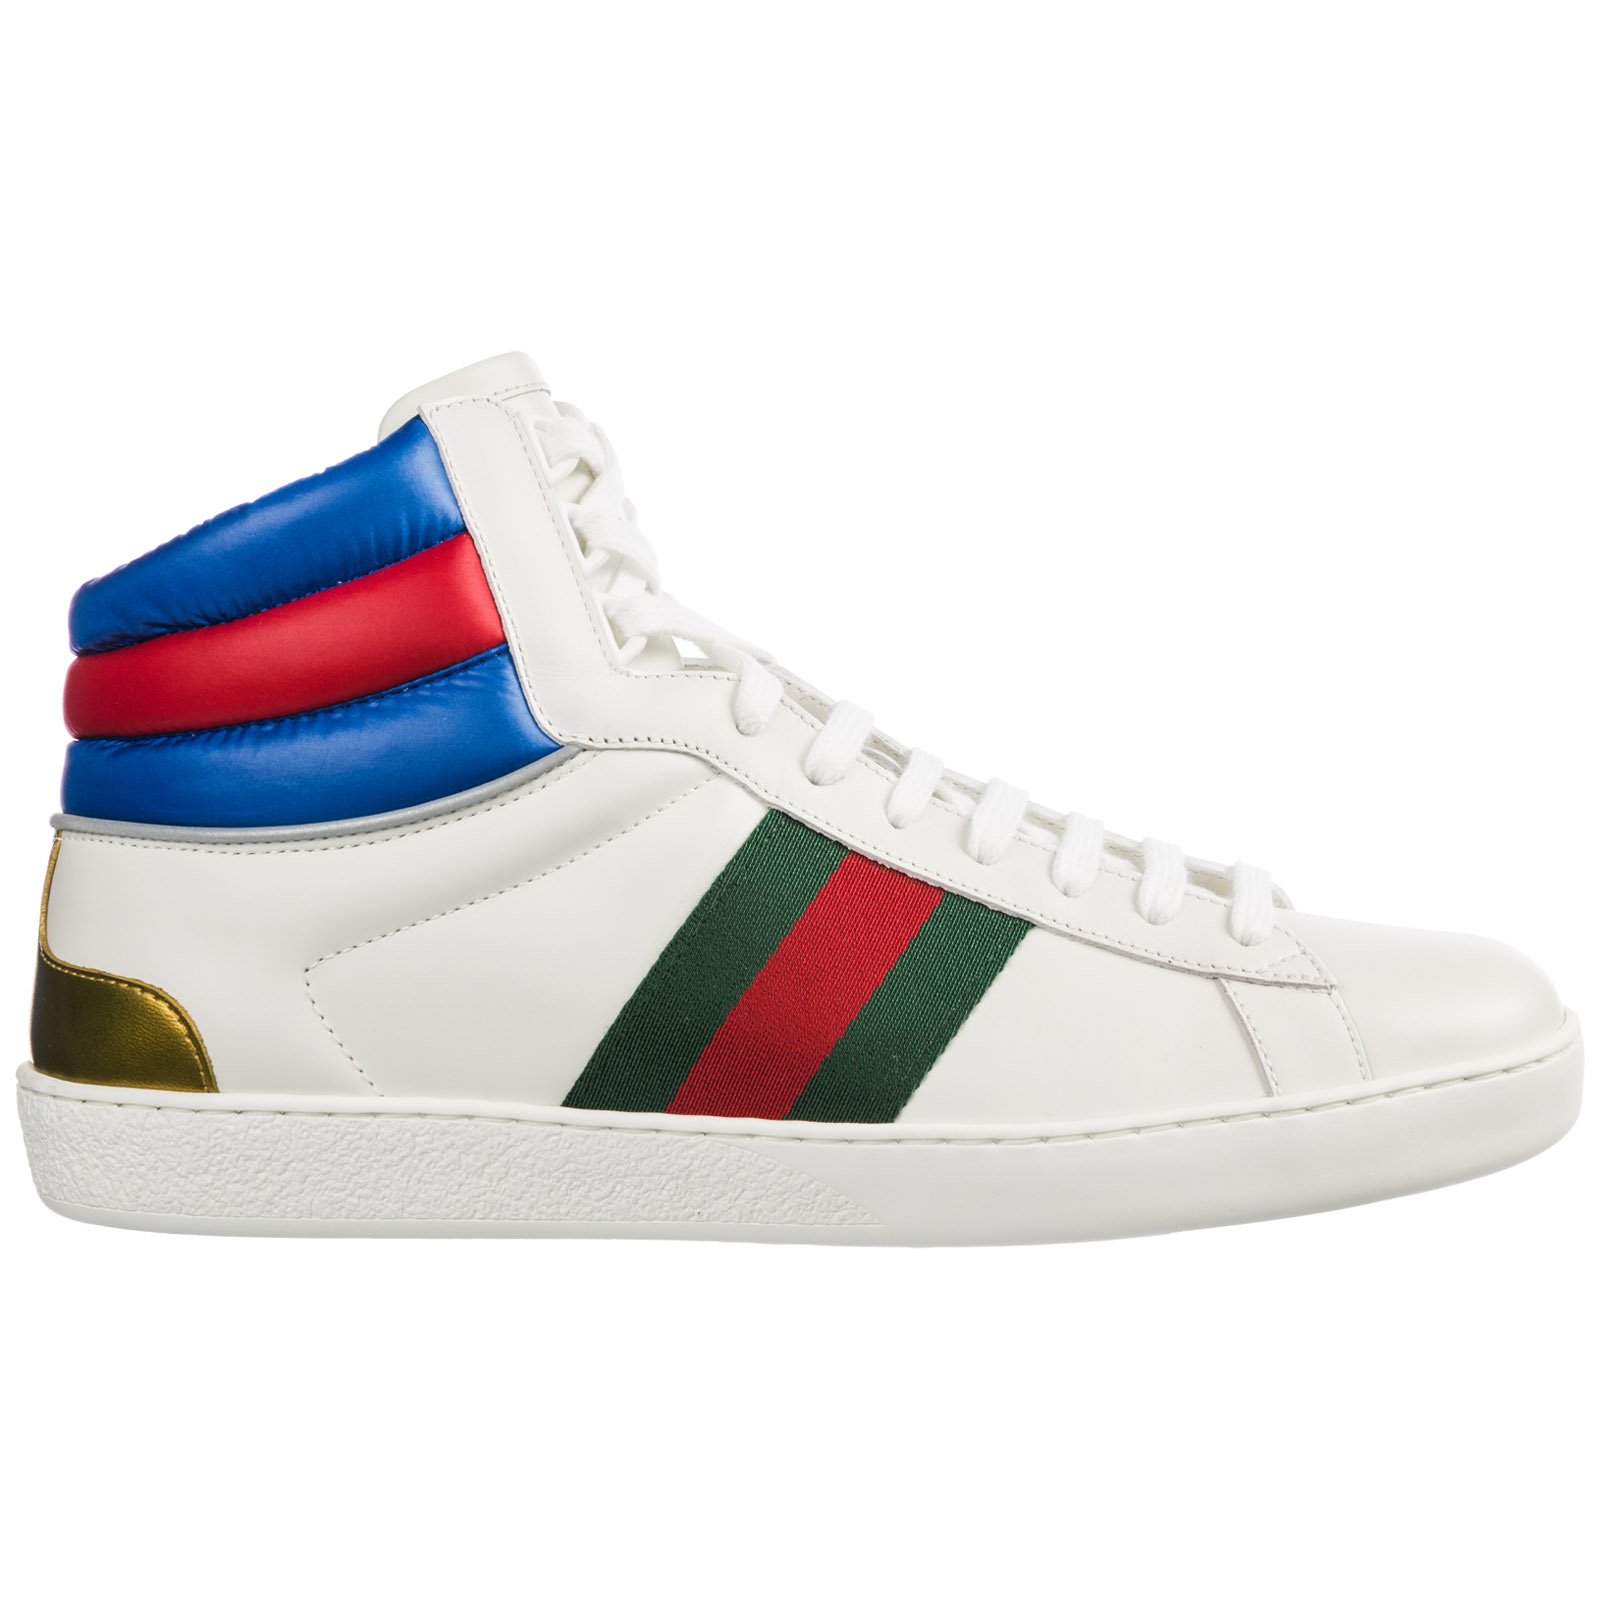 Sneakers alte Gucci Ace 548689 0RDQ0 9060 bianco  d8a4afe25d0